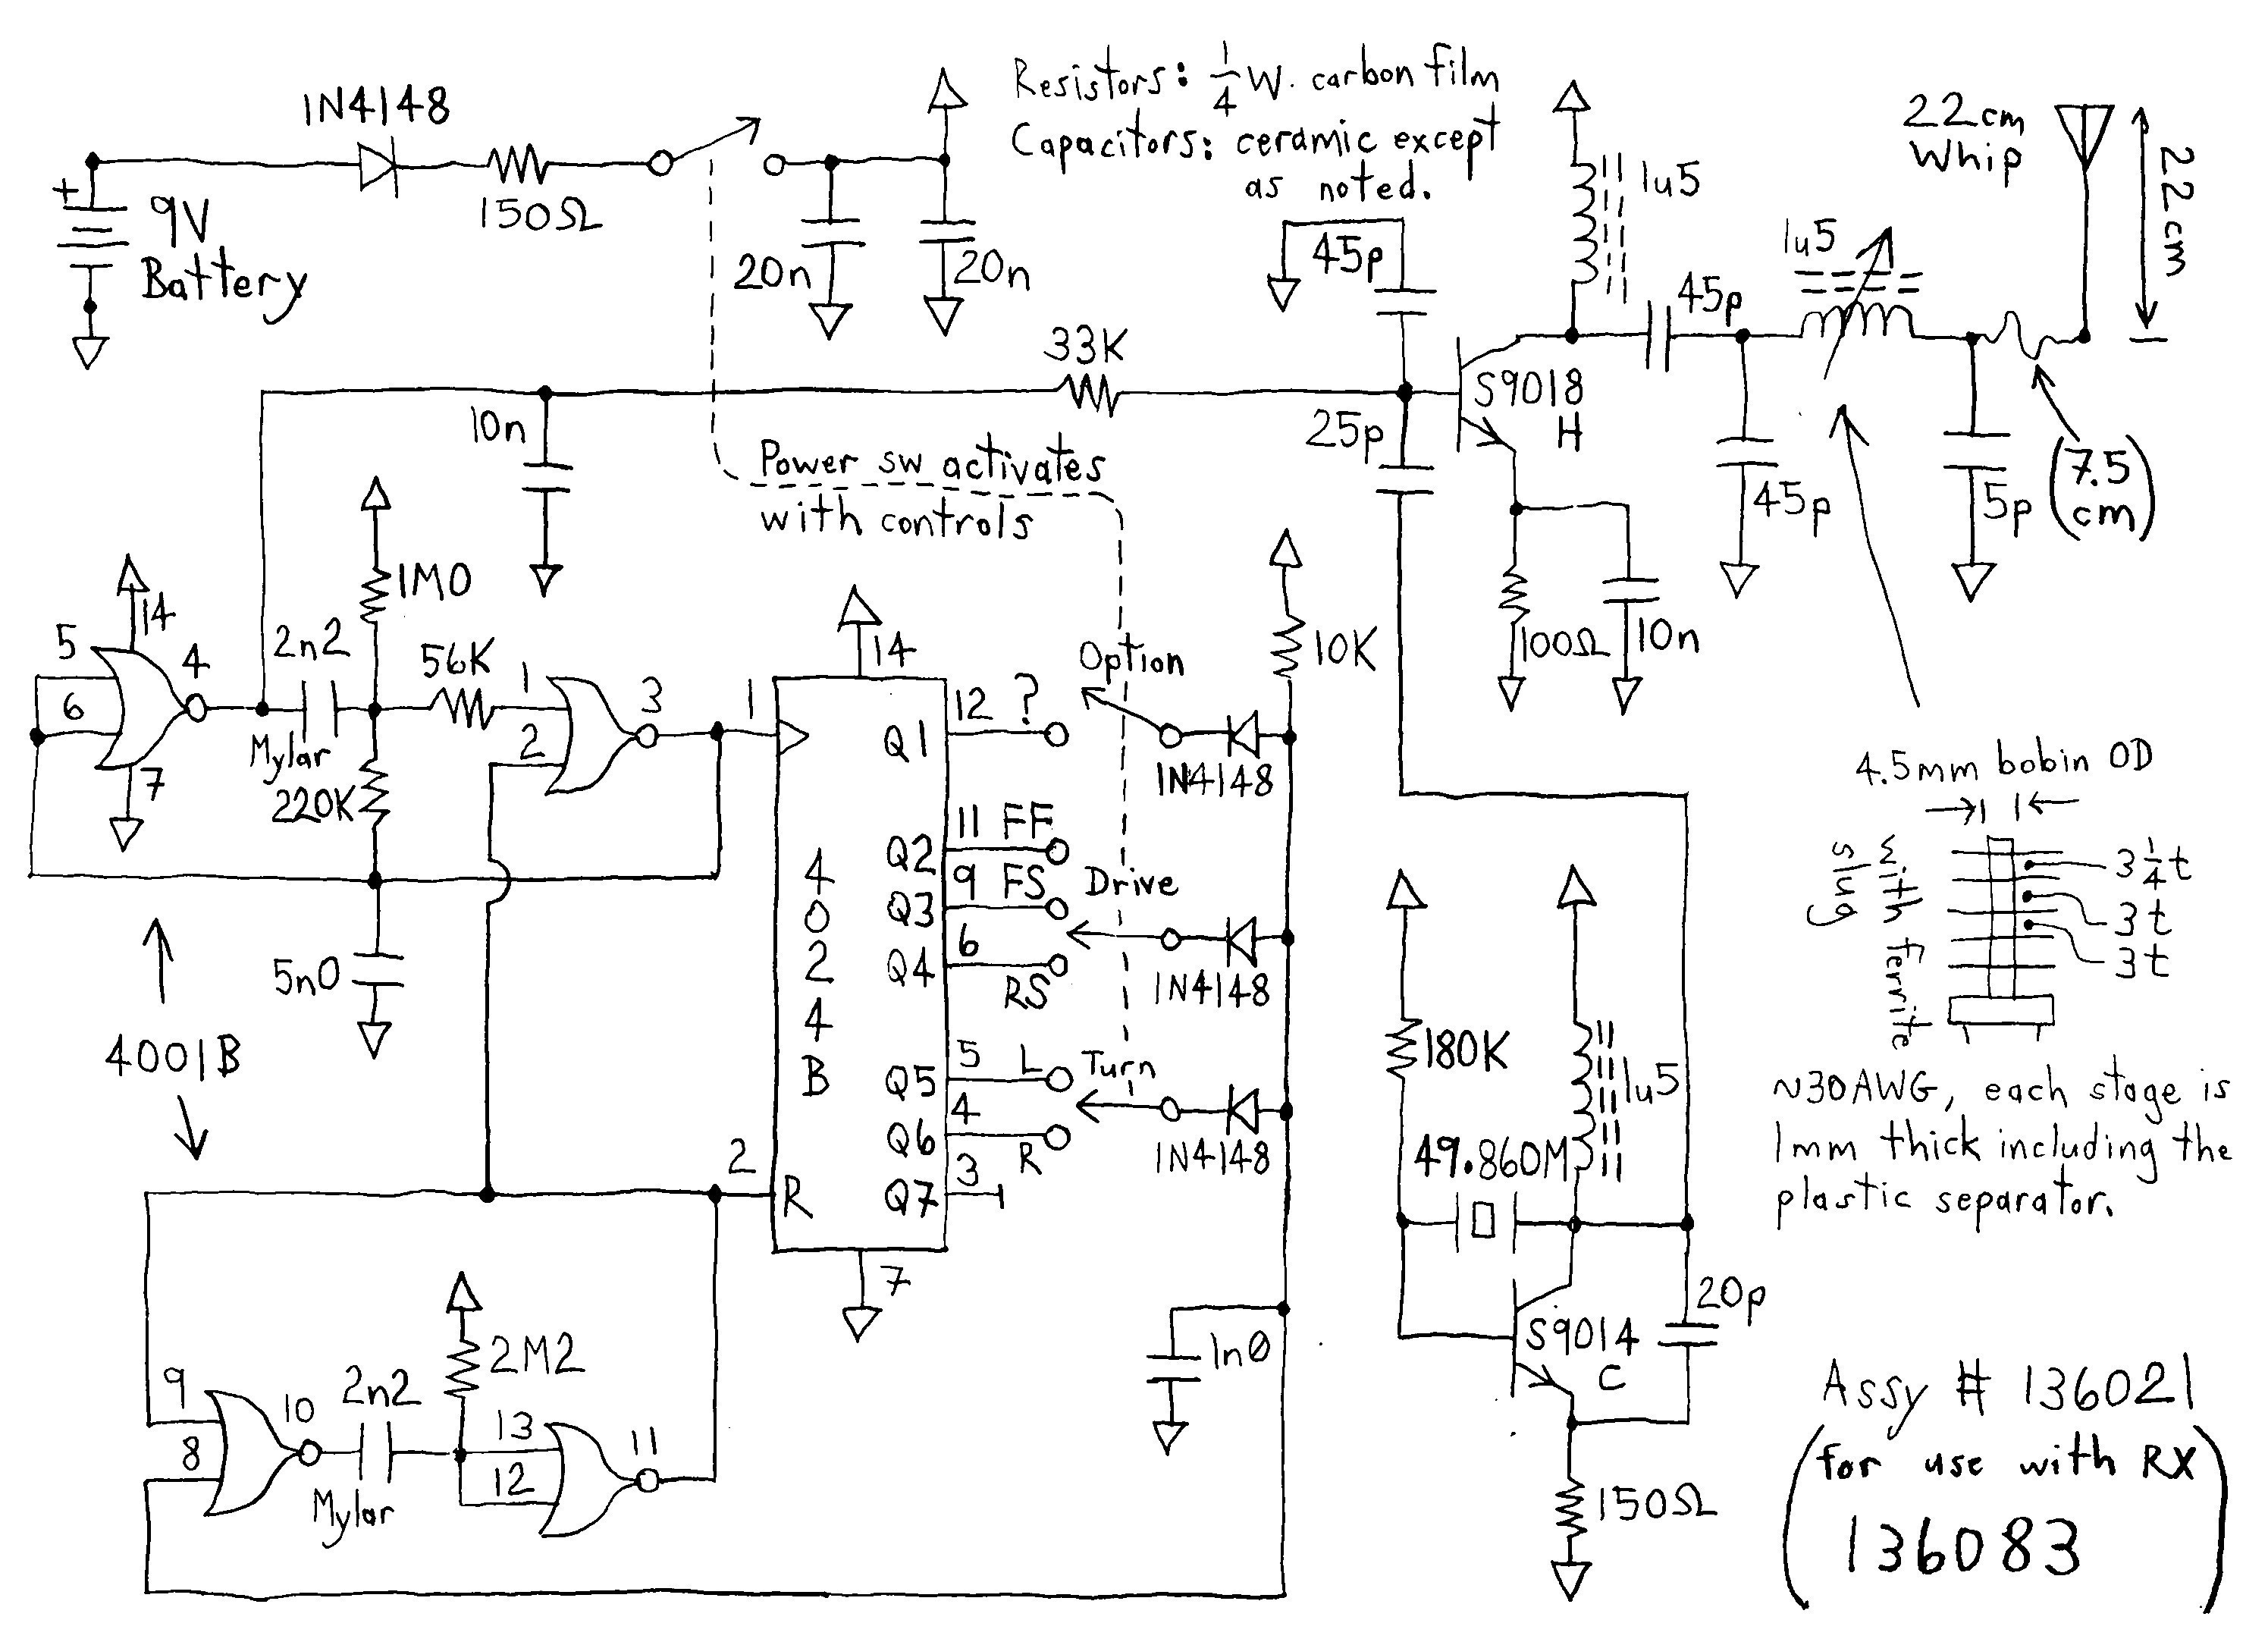 D16z6 Wiring Diagram. D16y7 Wiring Diagram, Chevy 350 Wiring ... on